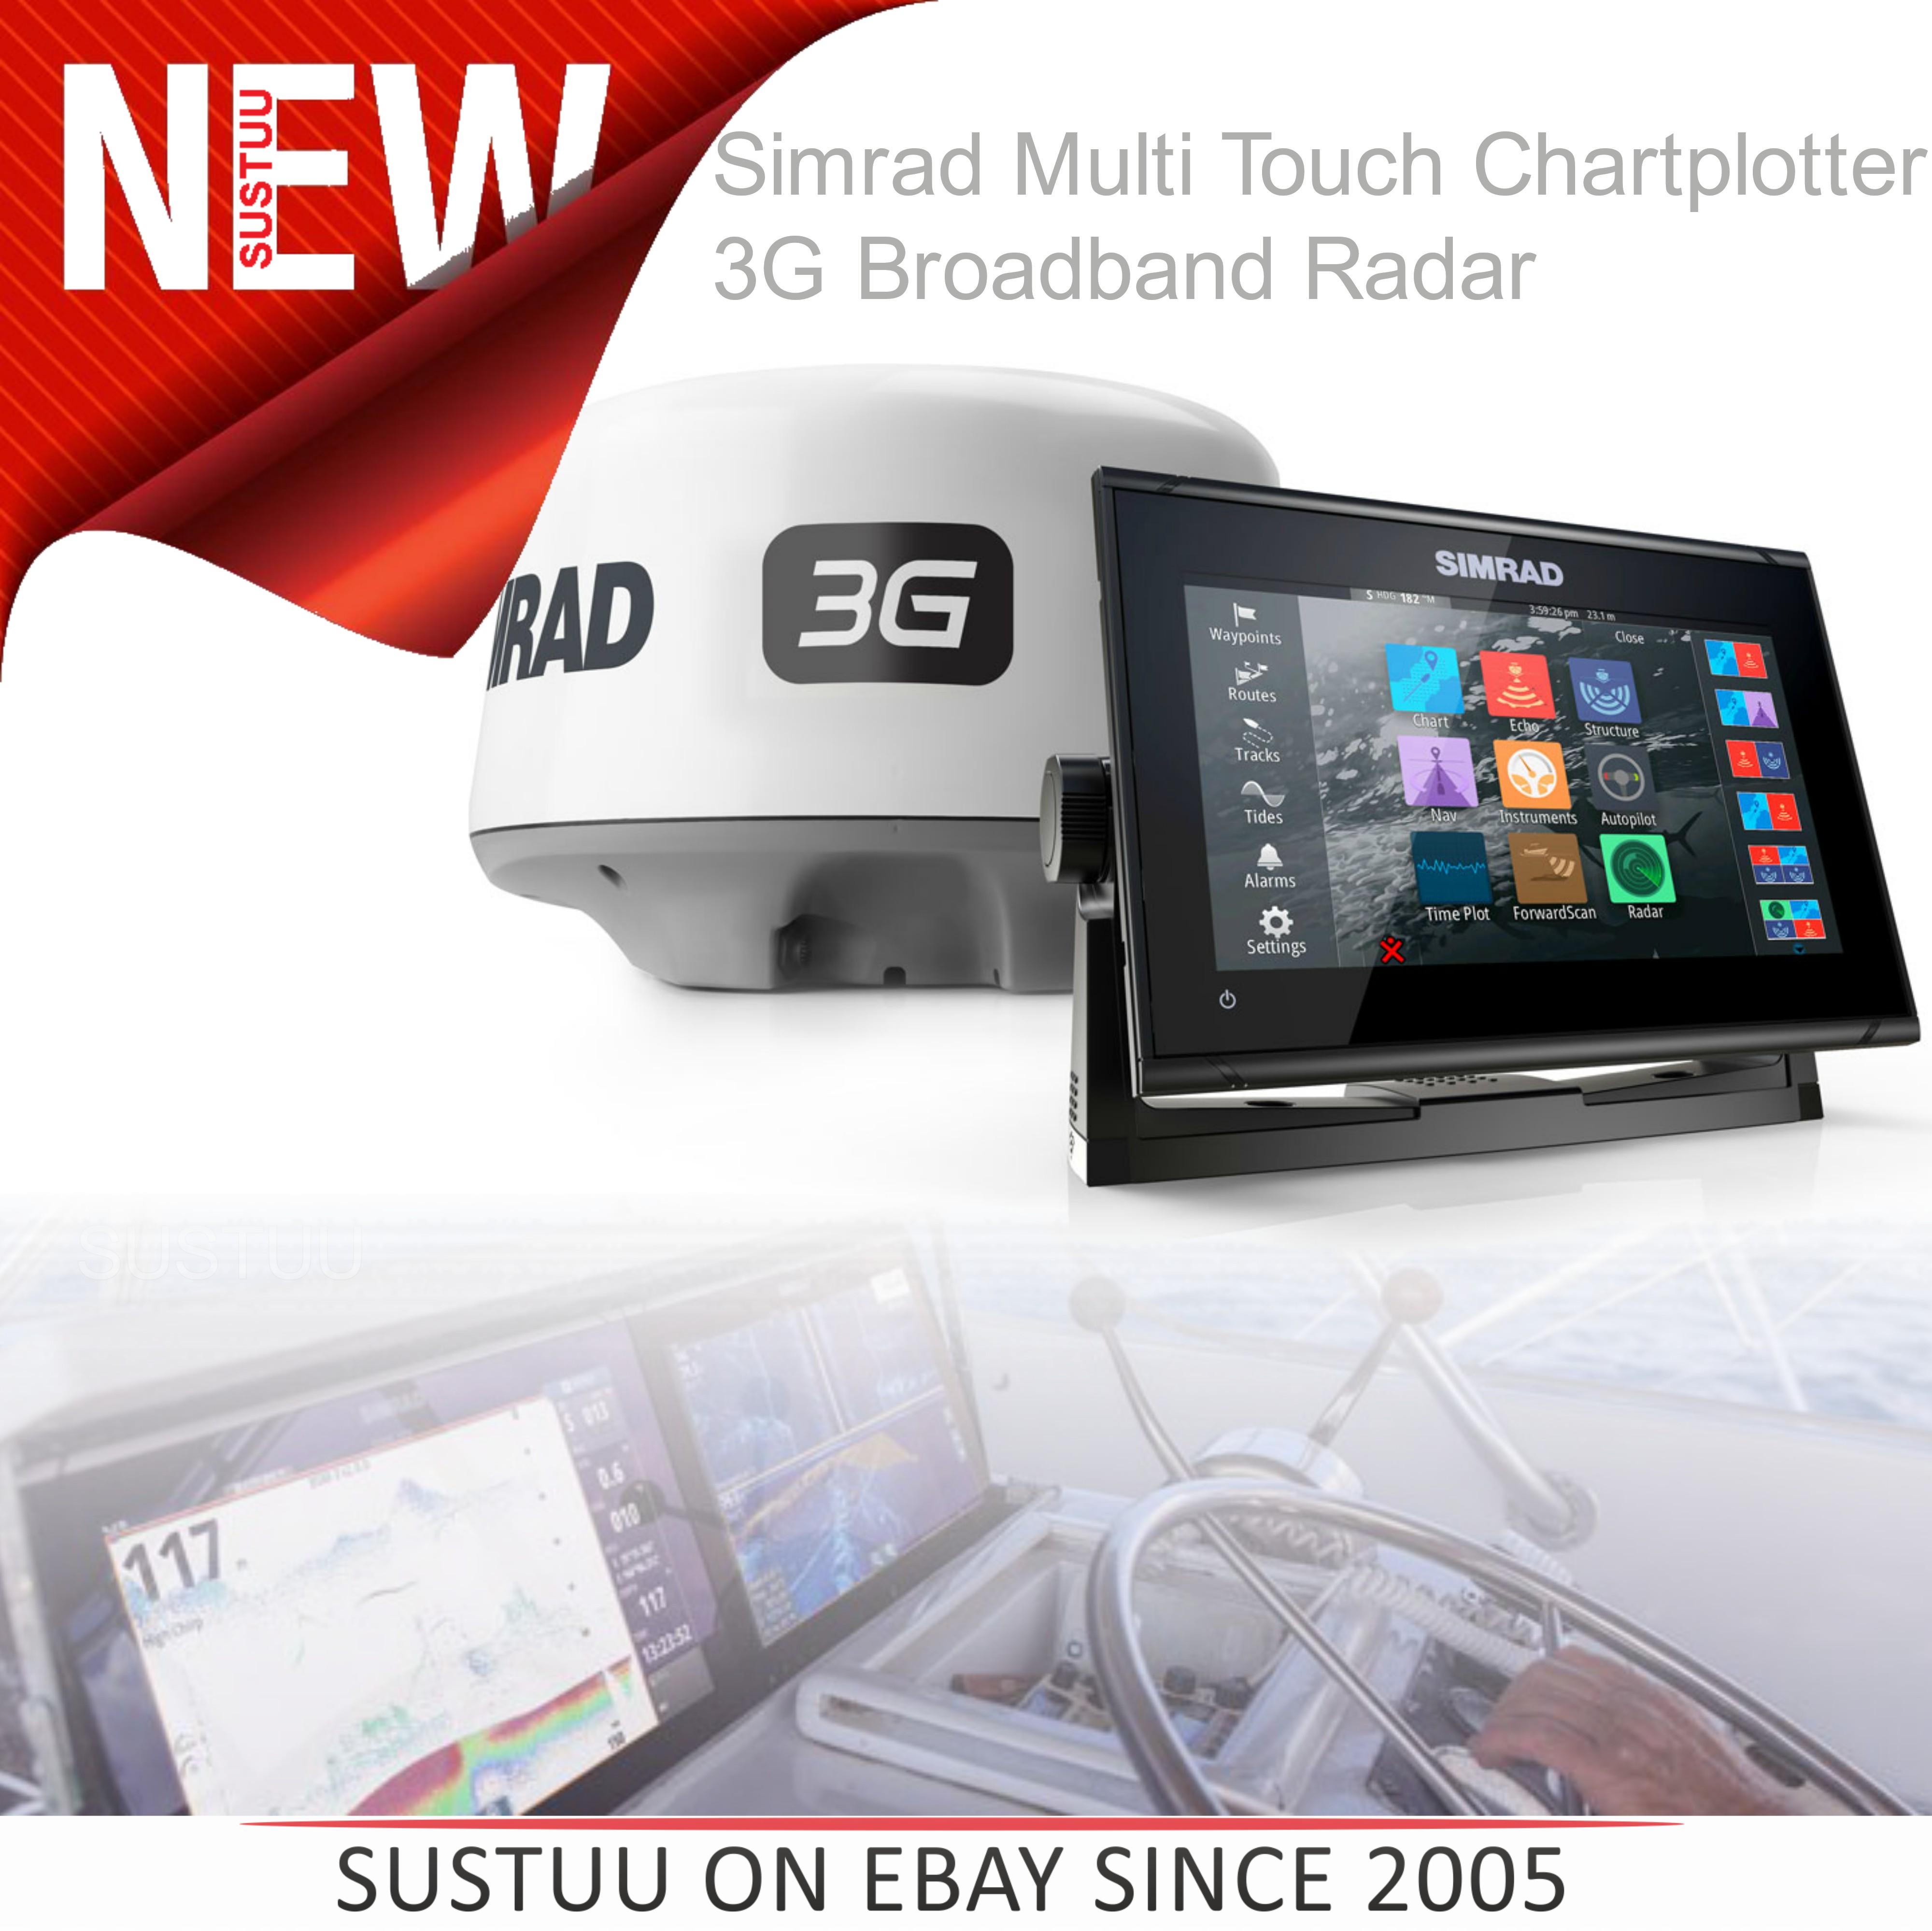 Simrad GO9 xse Multi Touch Chartplotter Marine 3G Brodband